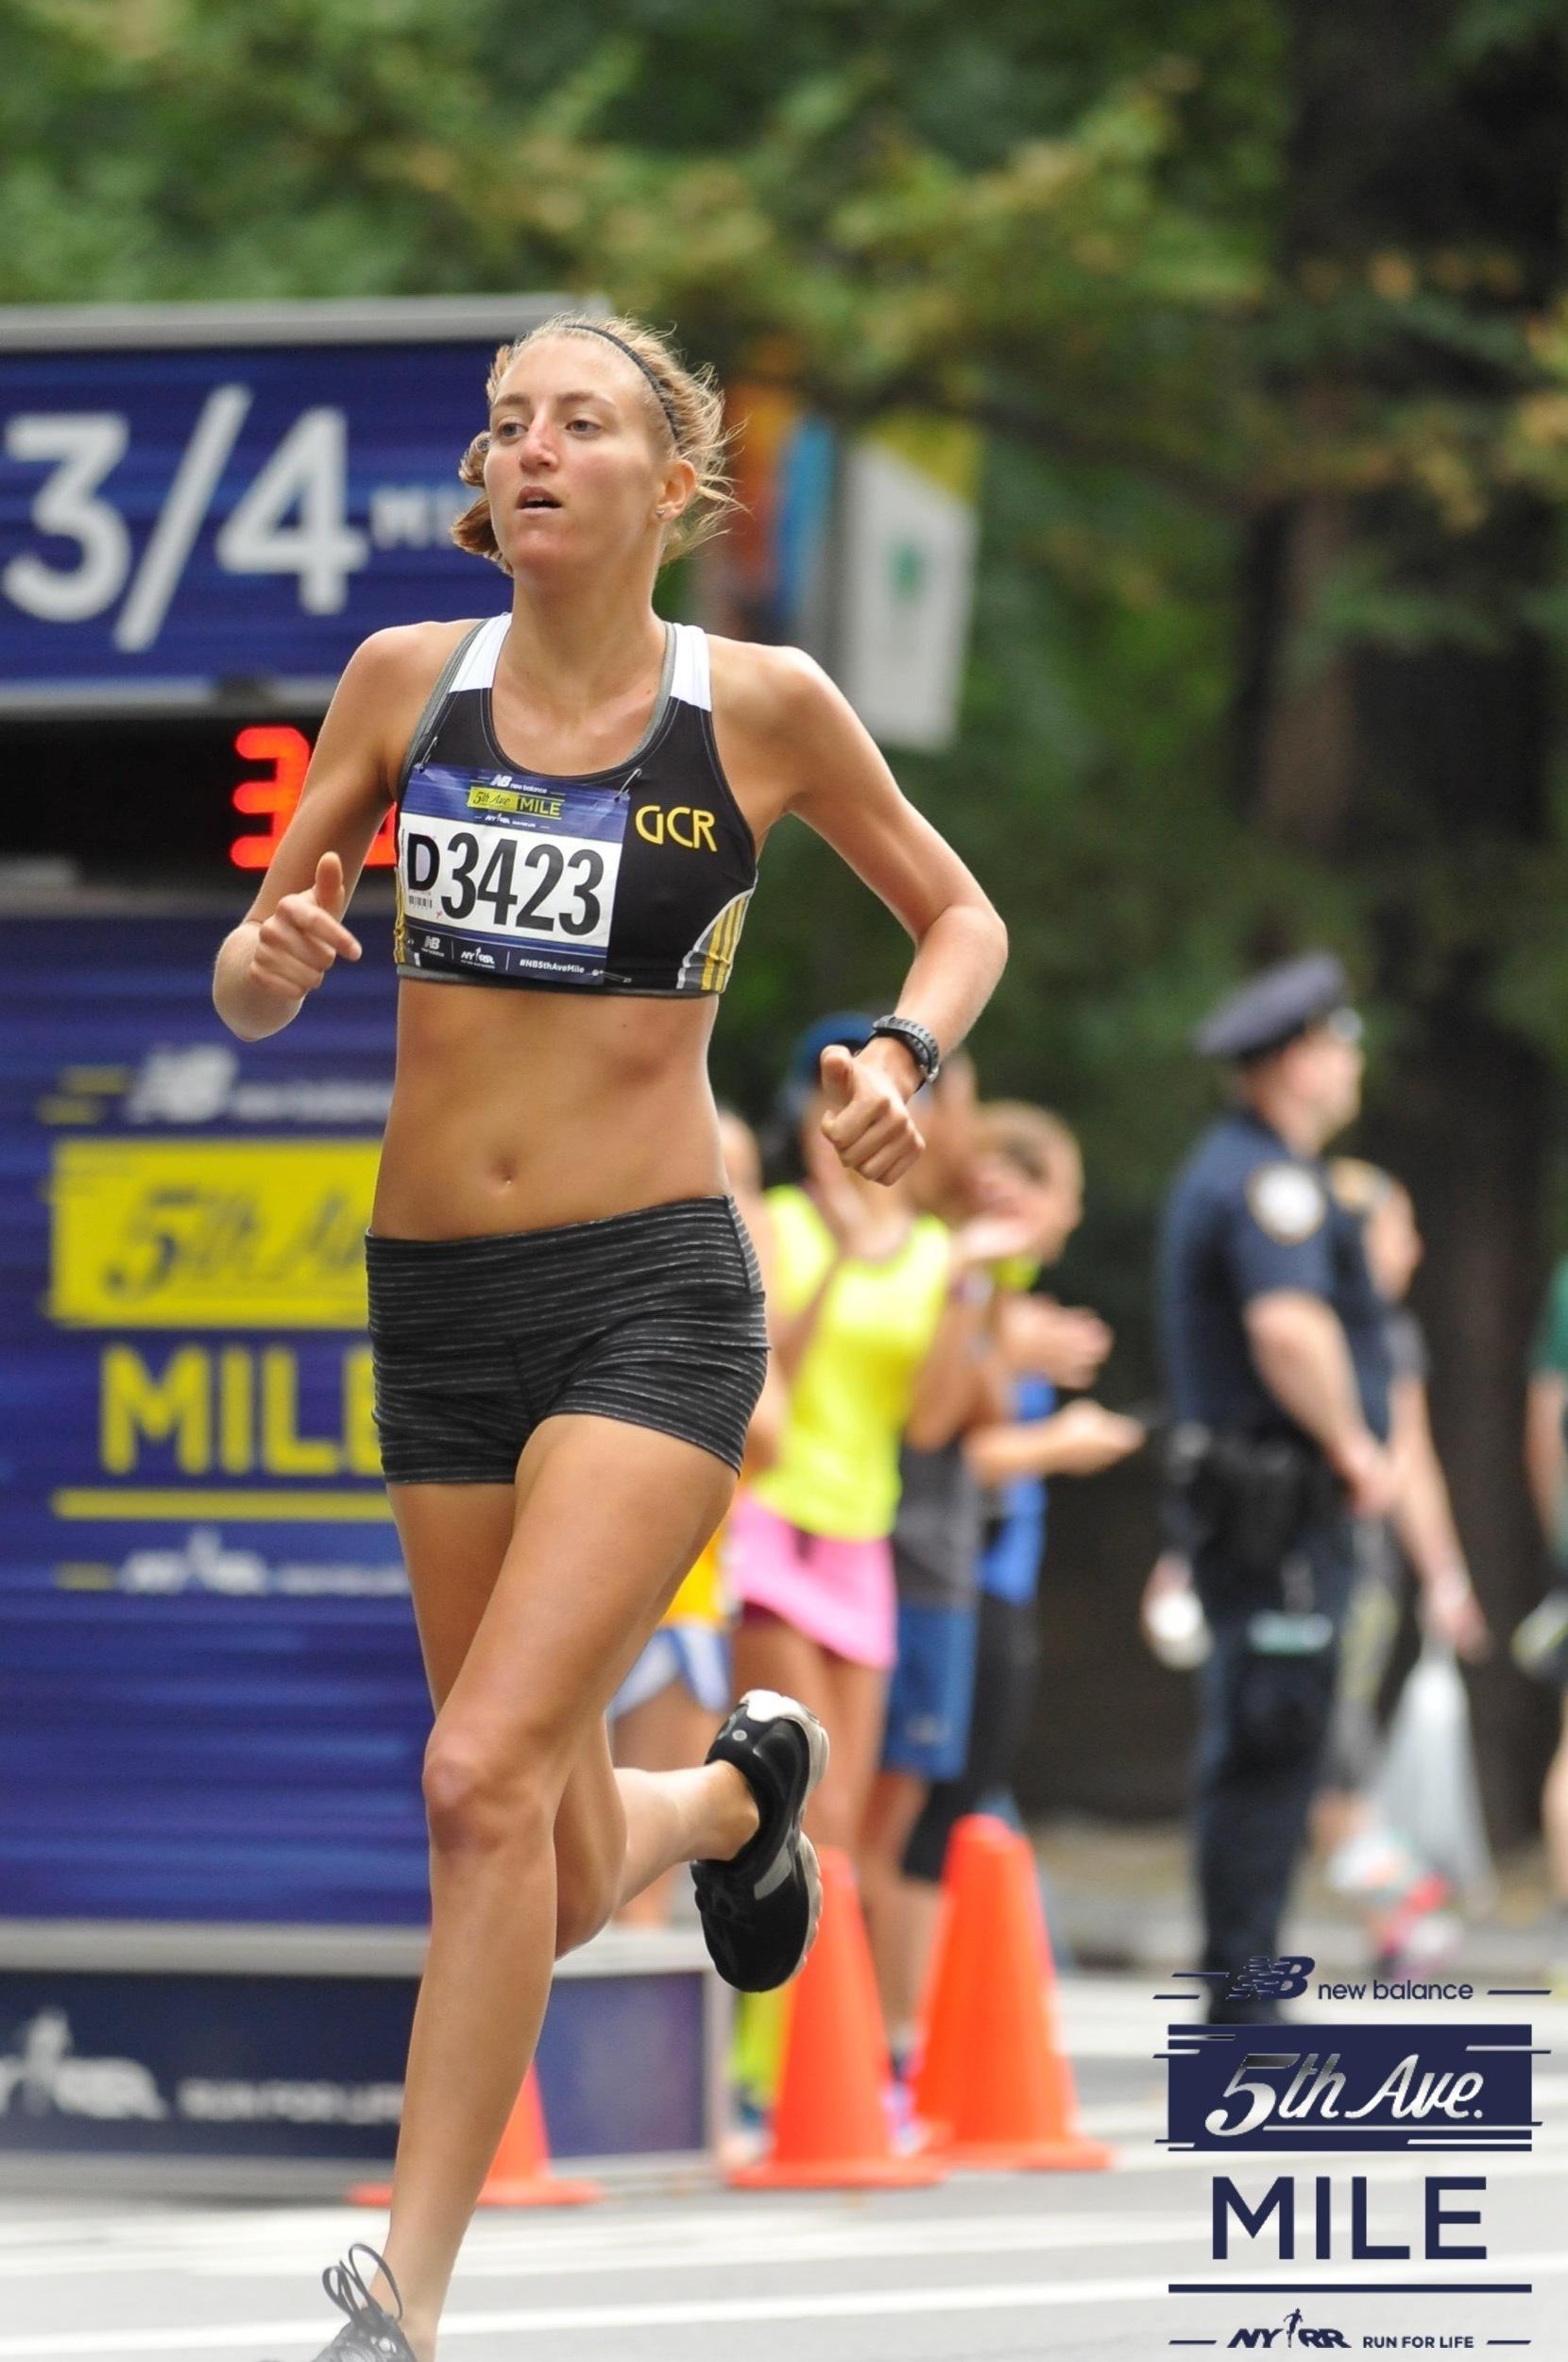 race_3060_photo_42352585.jpg